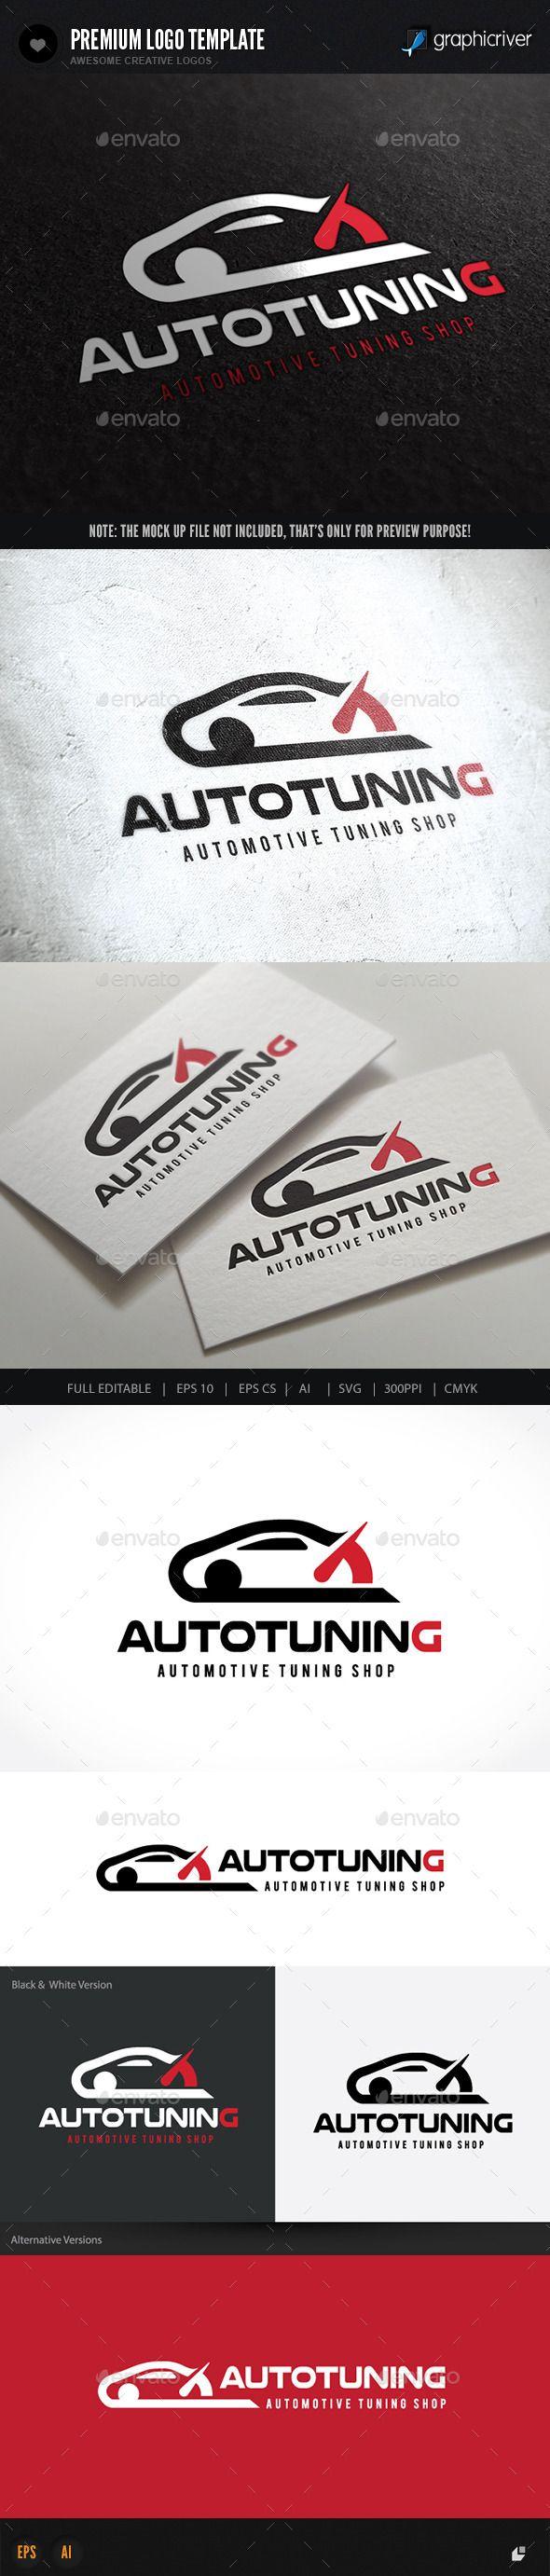 Car body sticker design eps - Auto Tuning